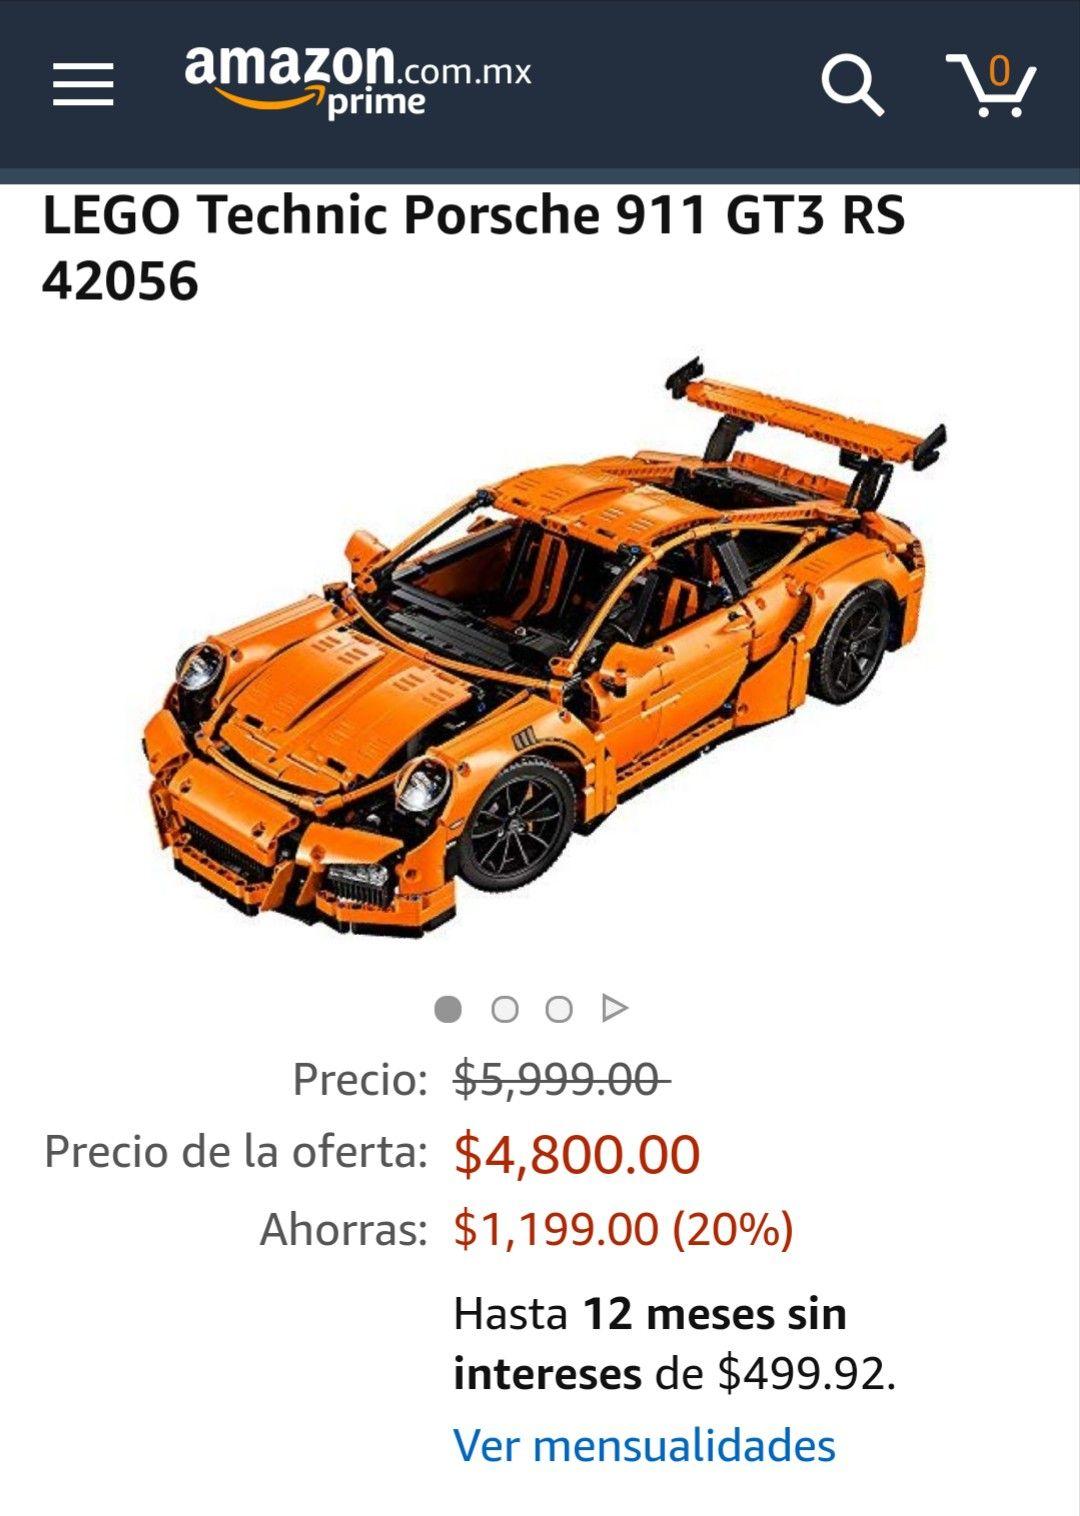 Amazon: LEGO Technic Porsche